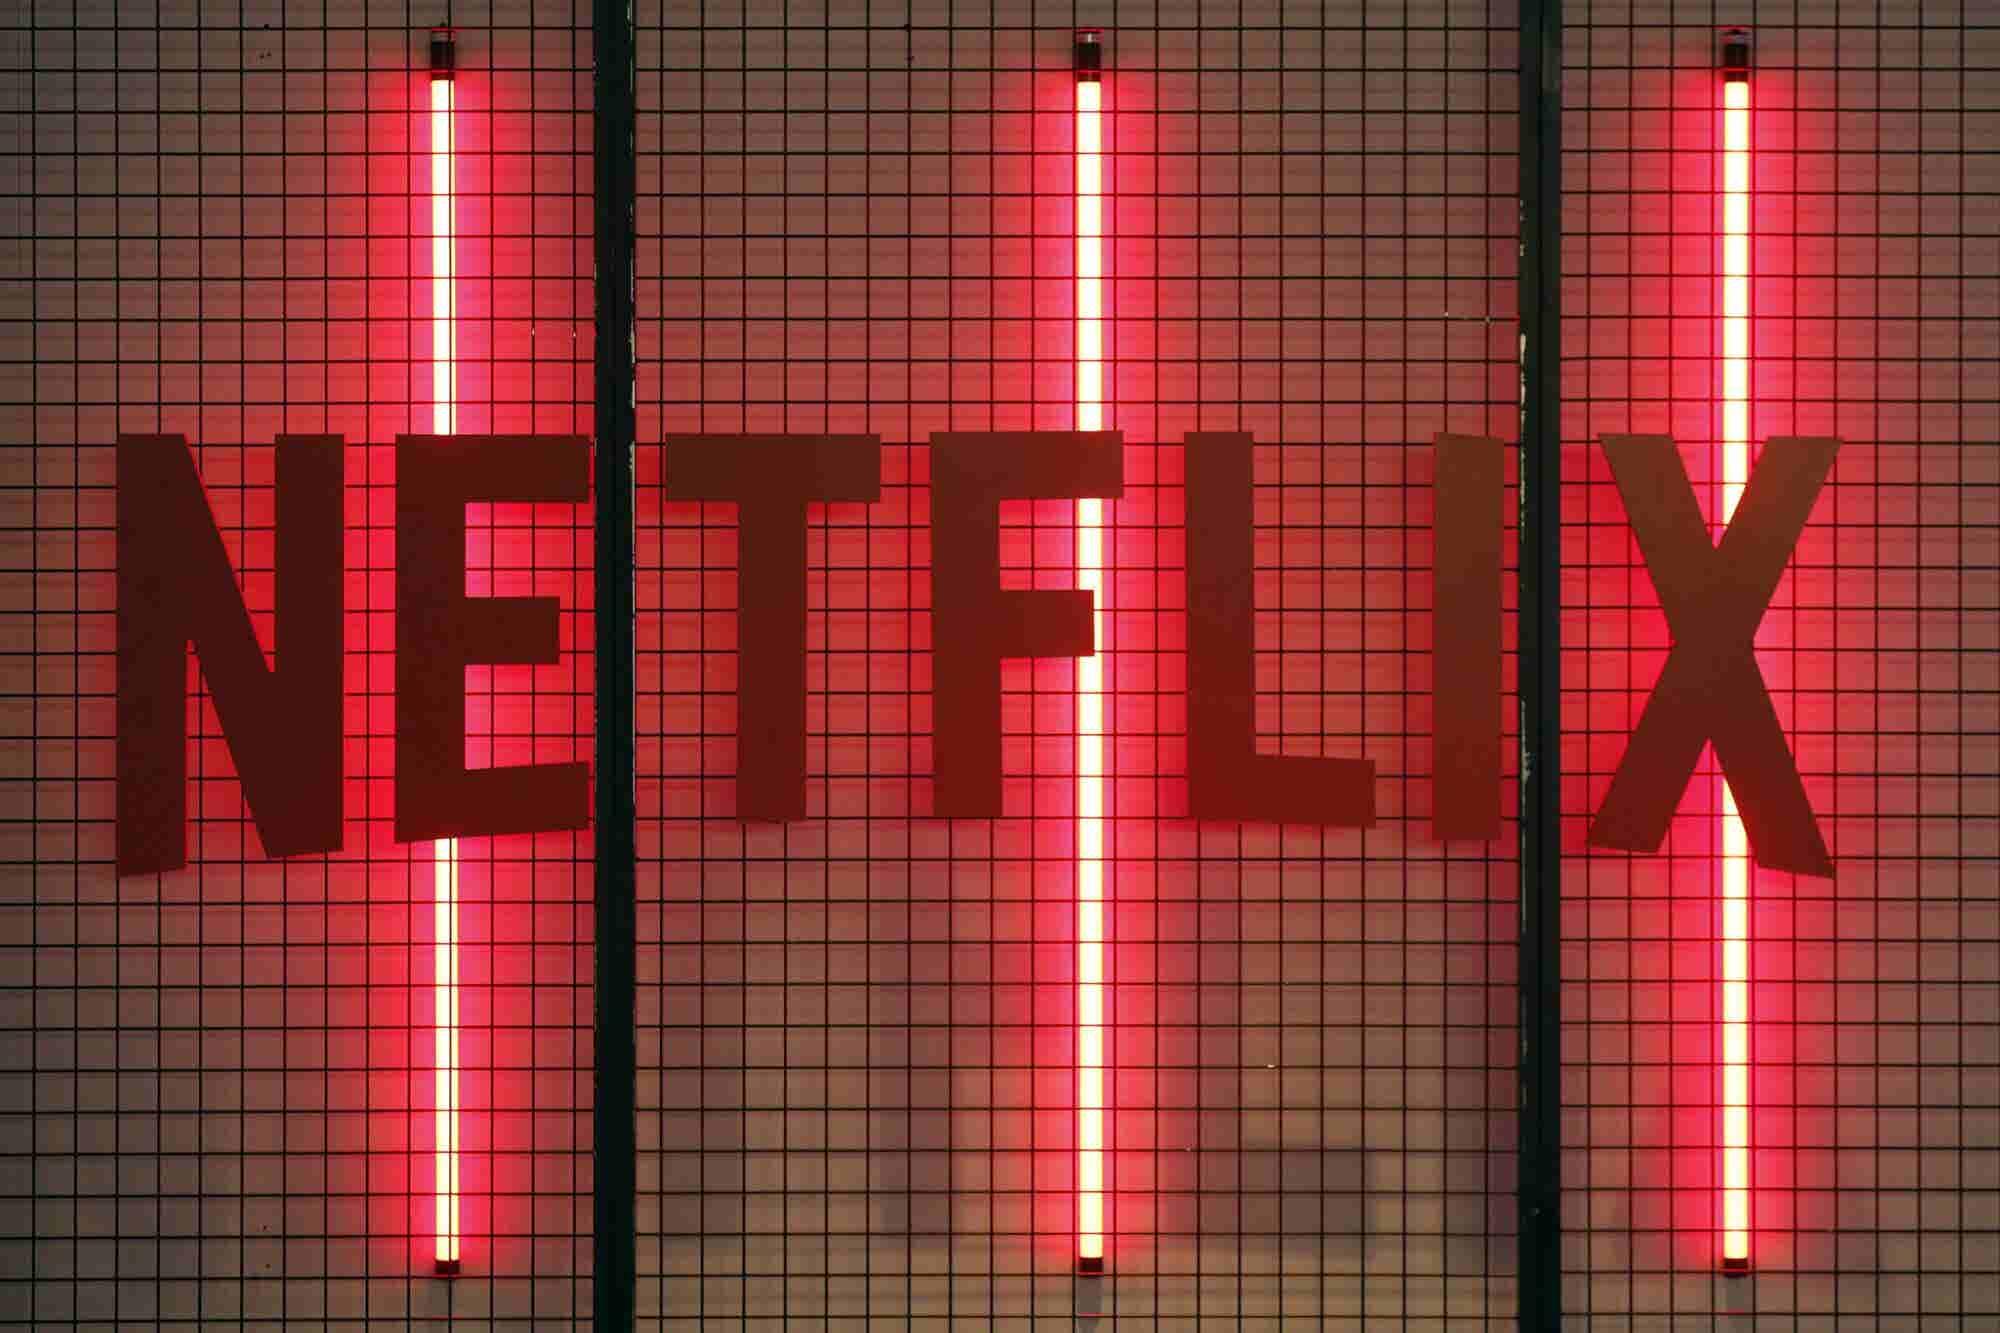 The Entrepreneur Index™ Rides Netflix's Coattails to Big Stock Jump